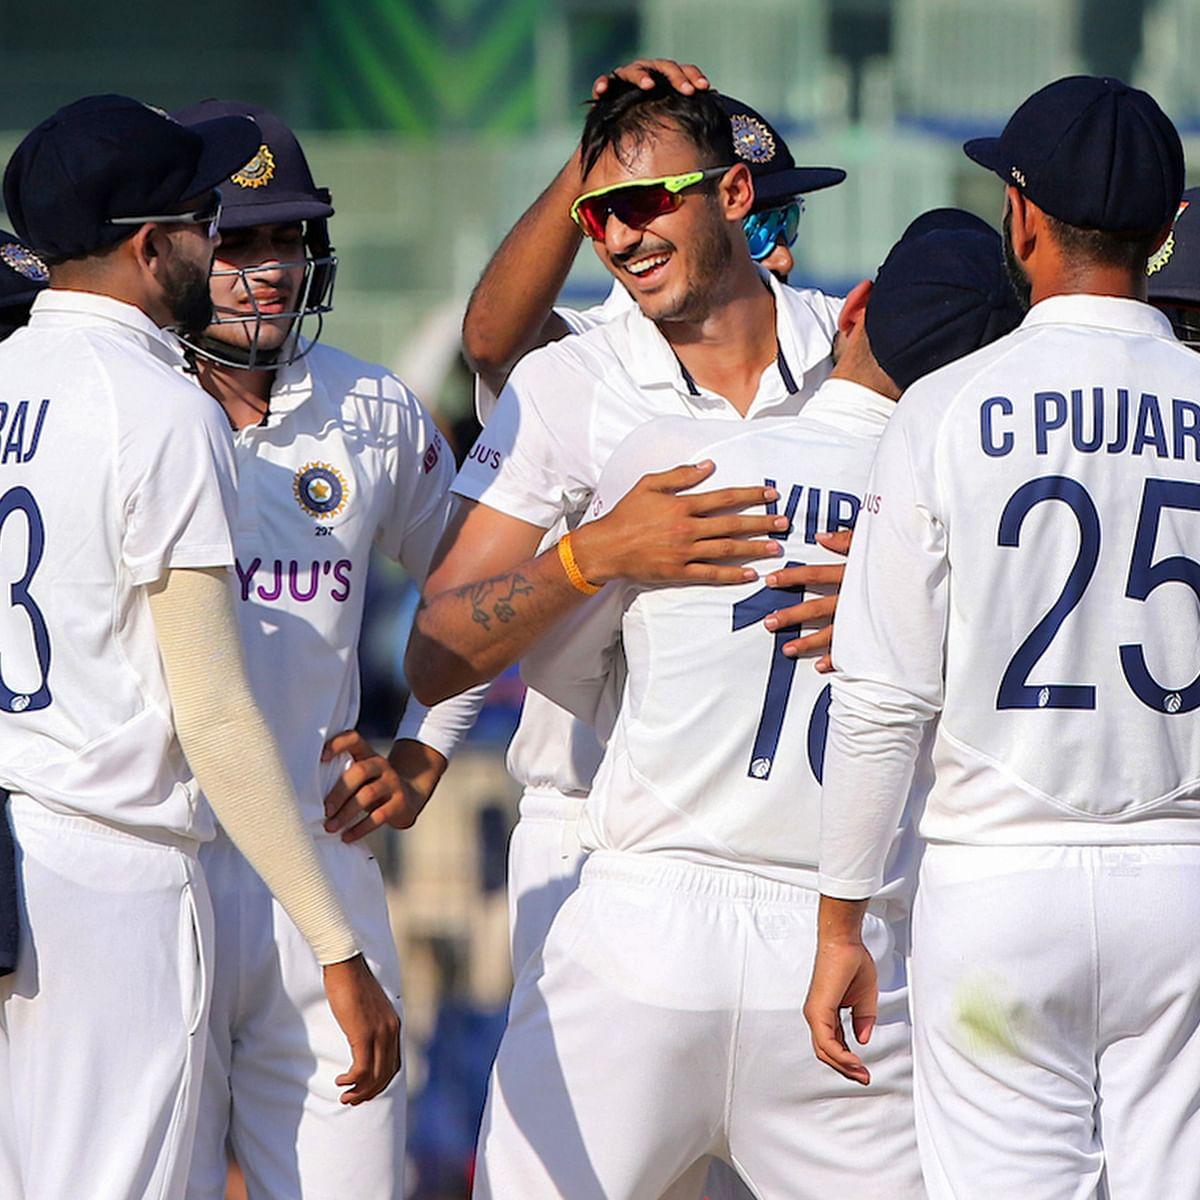 Ind vs Eng, 2nd Test: Axar Patel picks a fifer in his debut Test